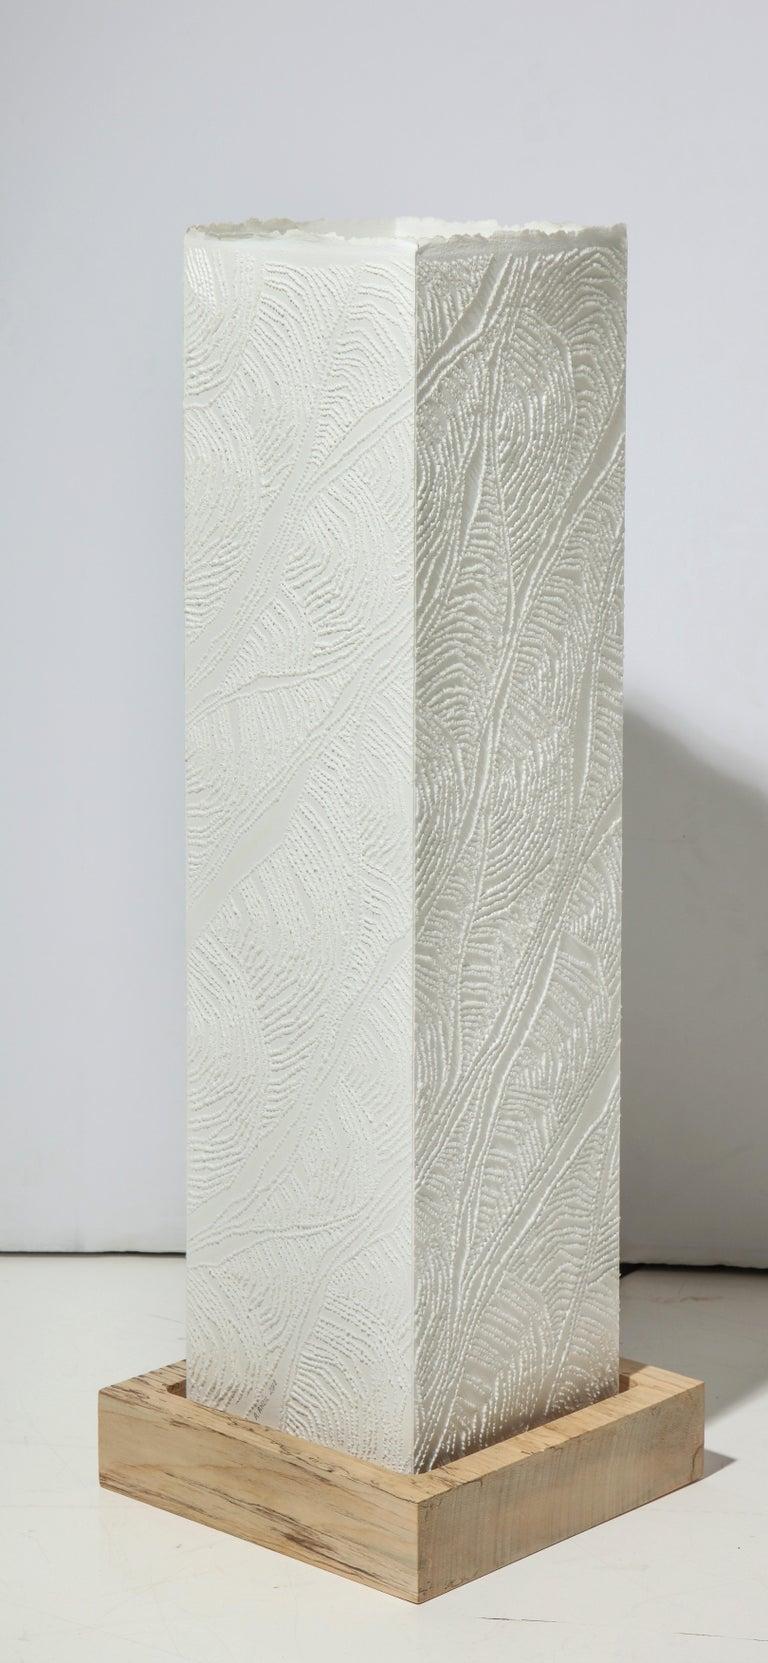 Lit Paper Sculpture by Antonin Anzil, France, 2018 For Sale 3